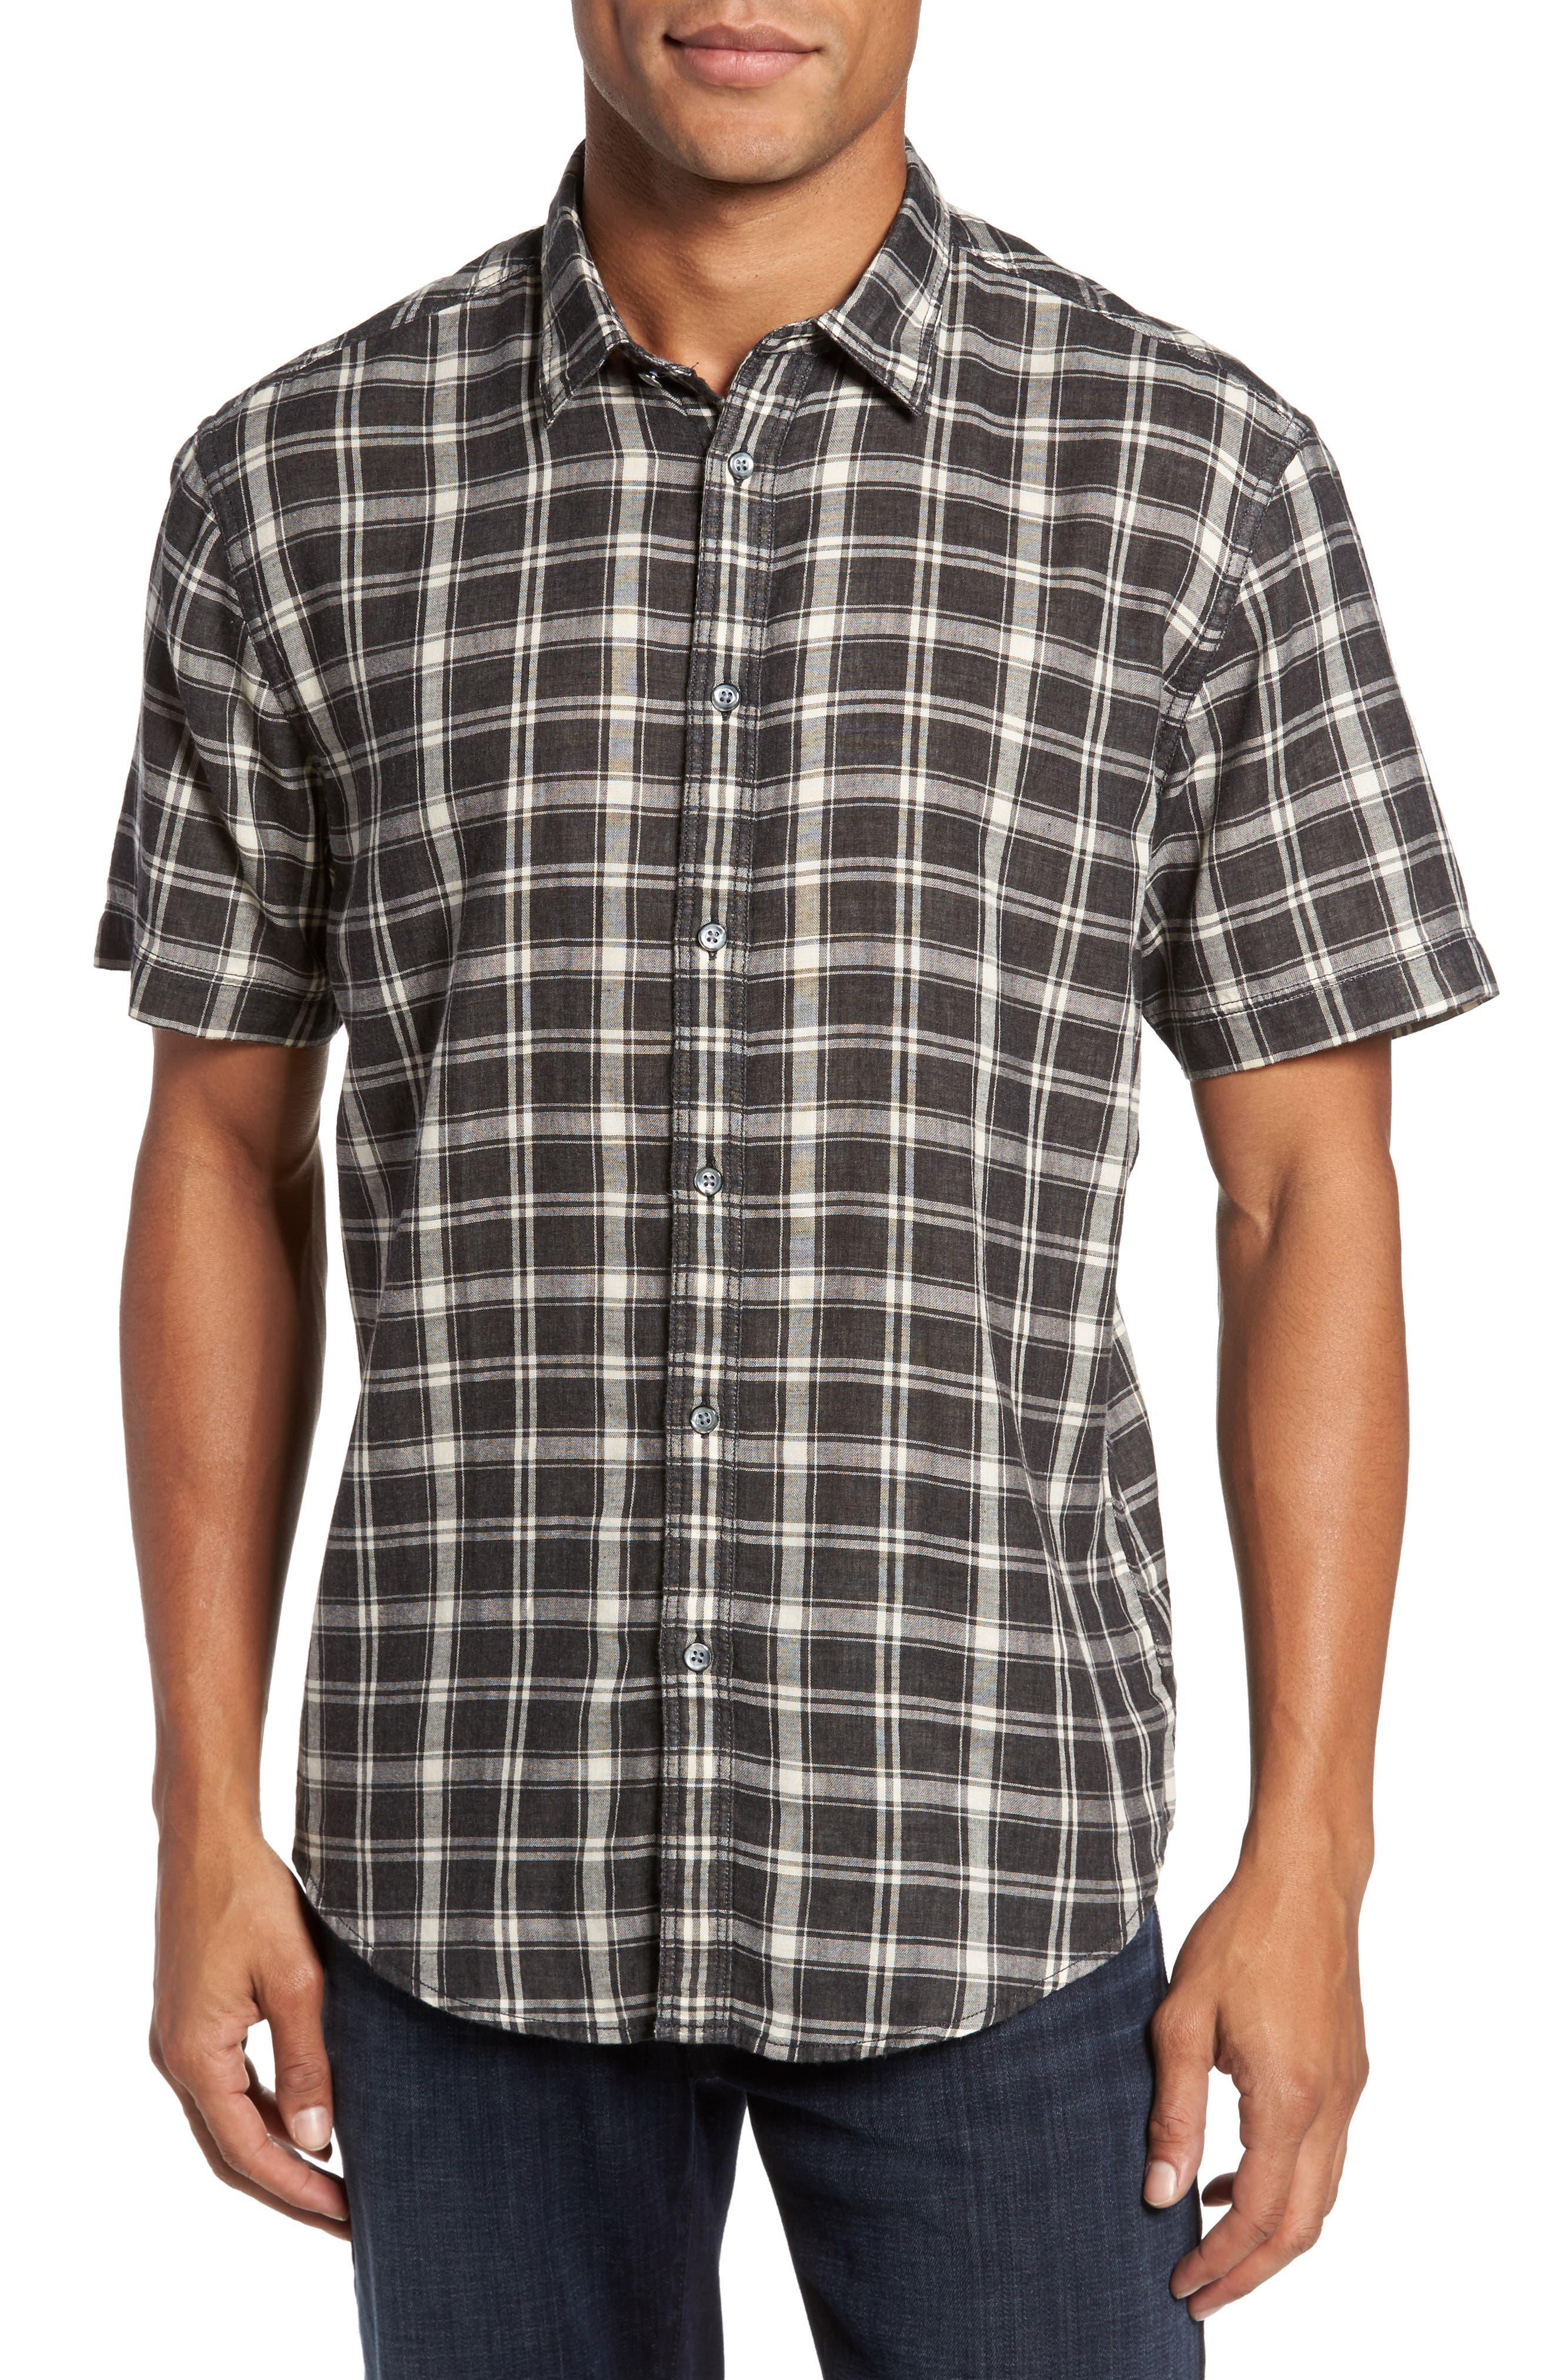 Coastaoro Hansen Regular Fit Plaid Sport Shirt